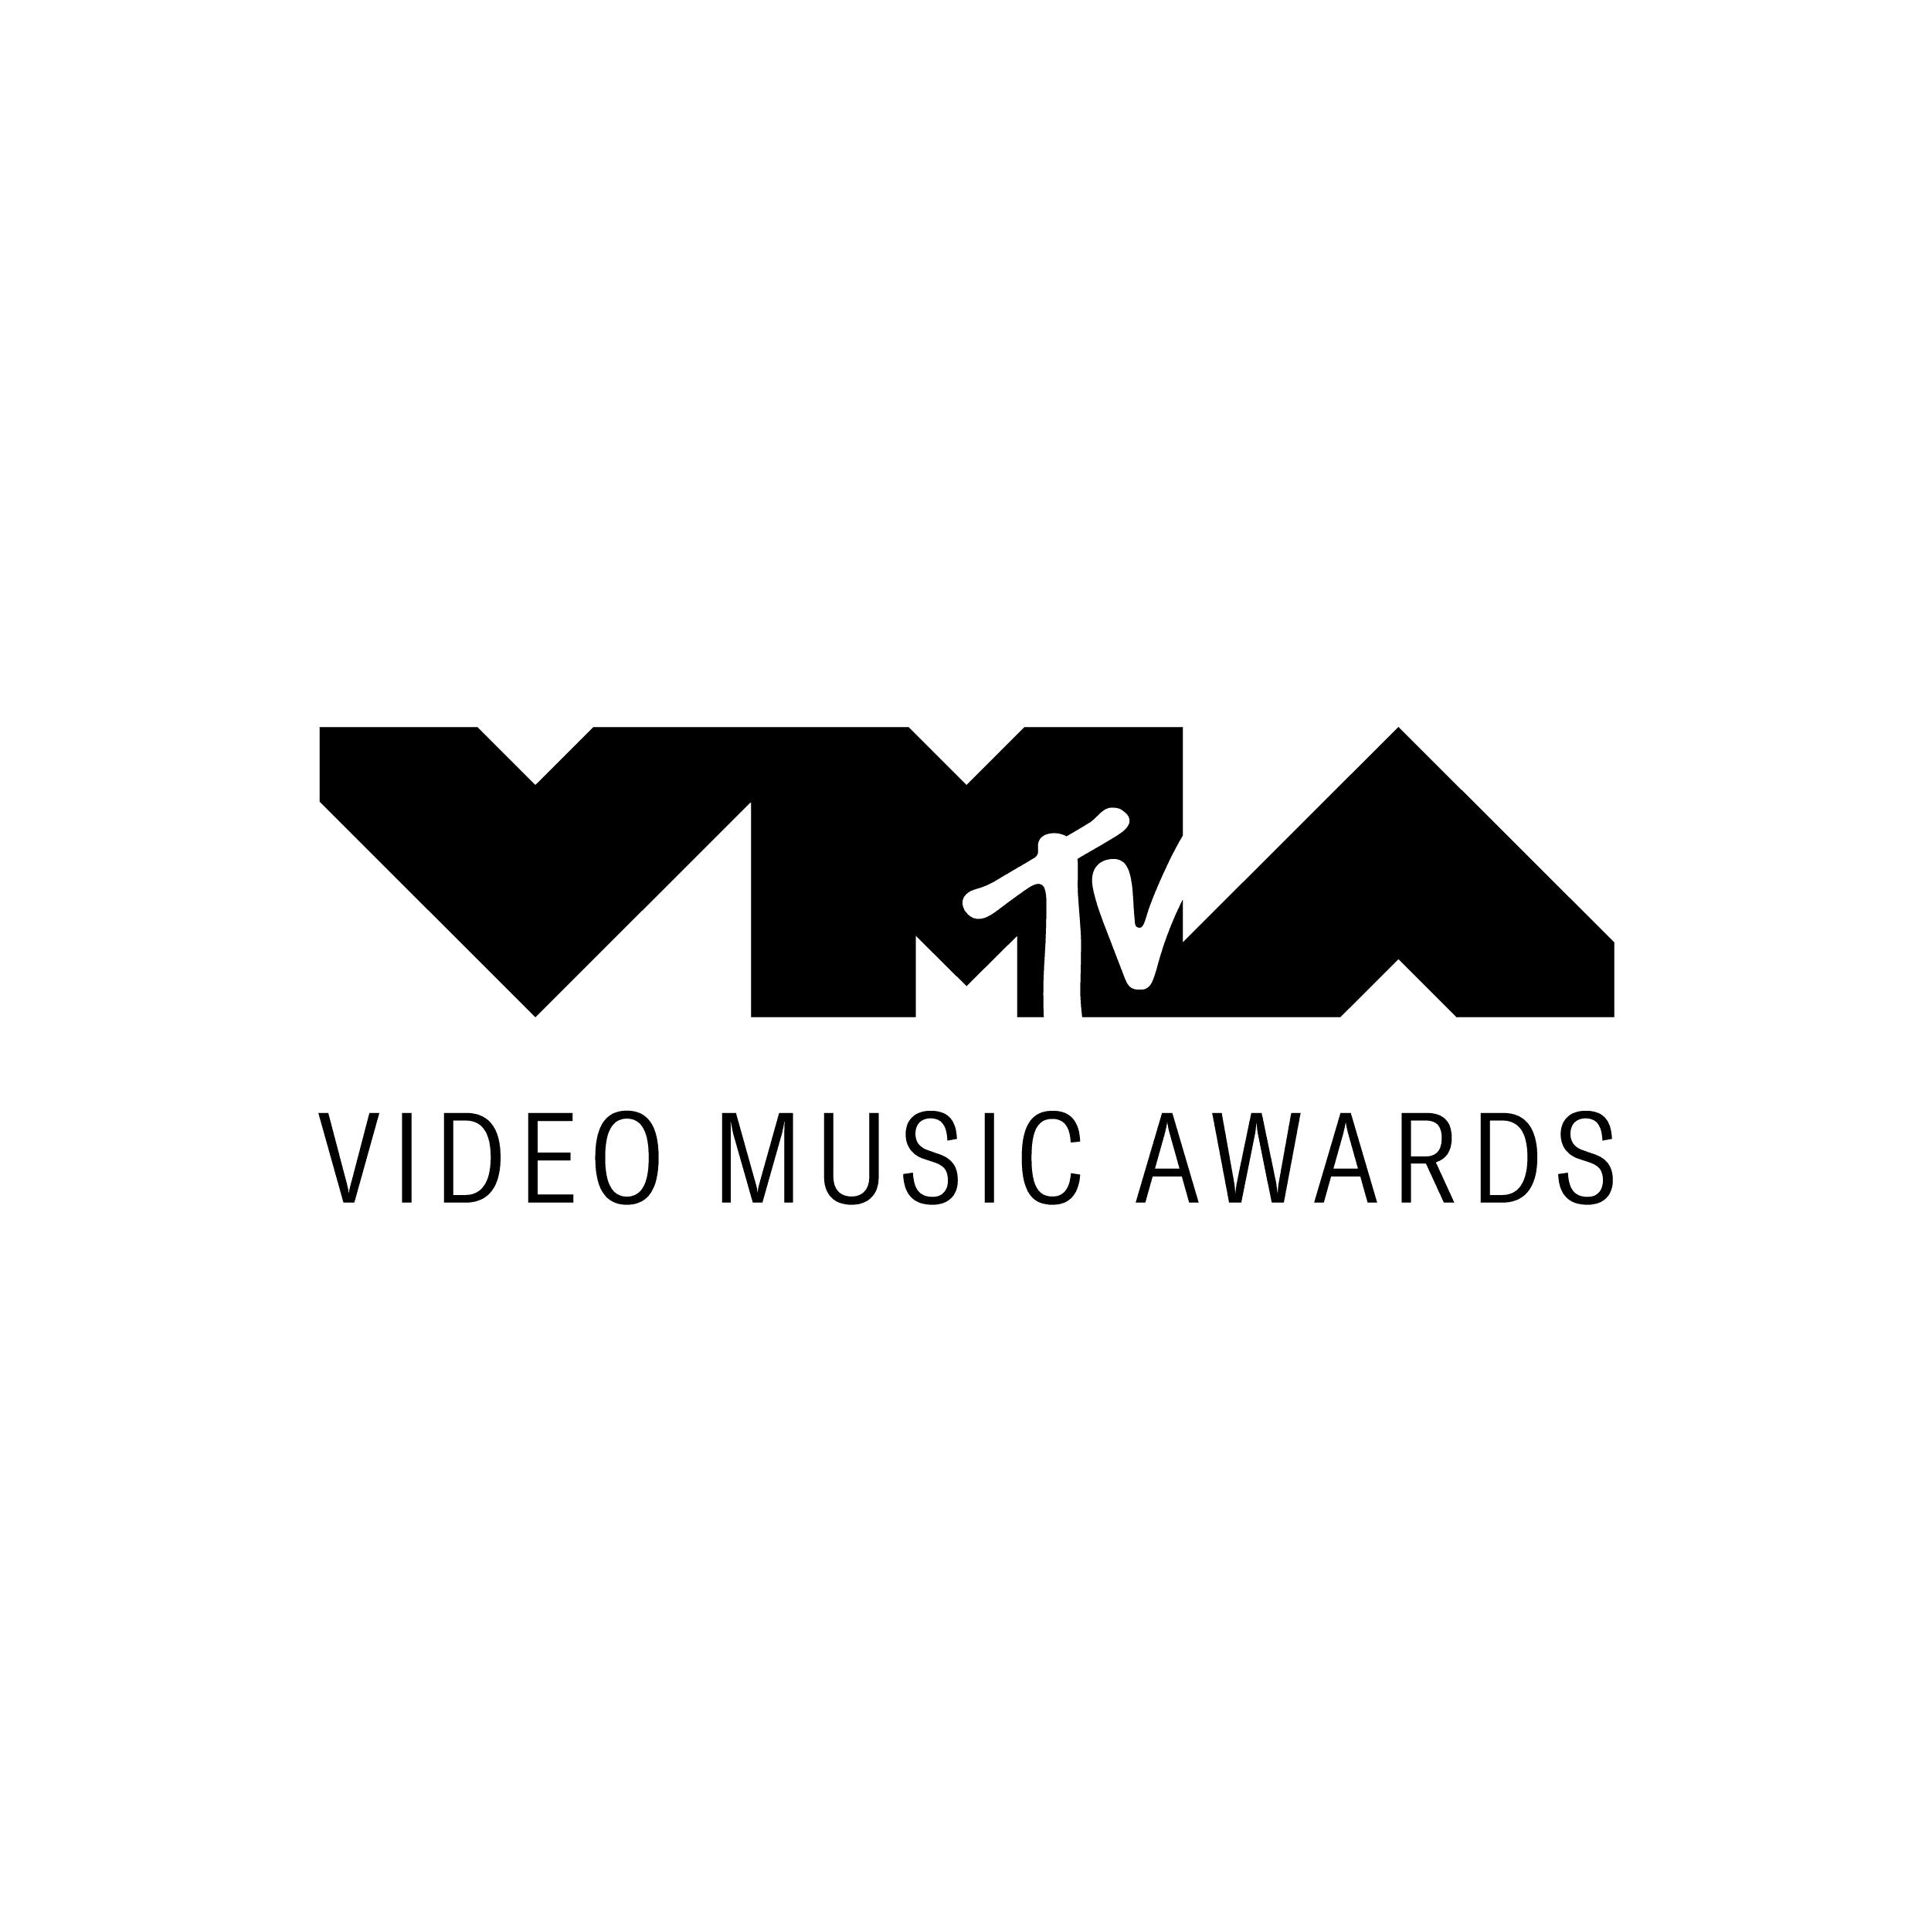 vma 2019 logo - Google Search